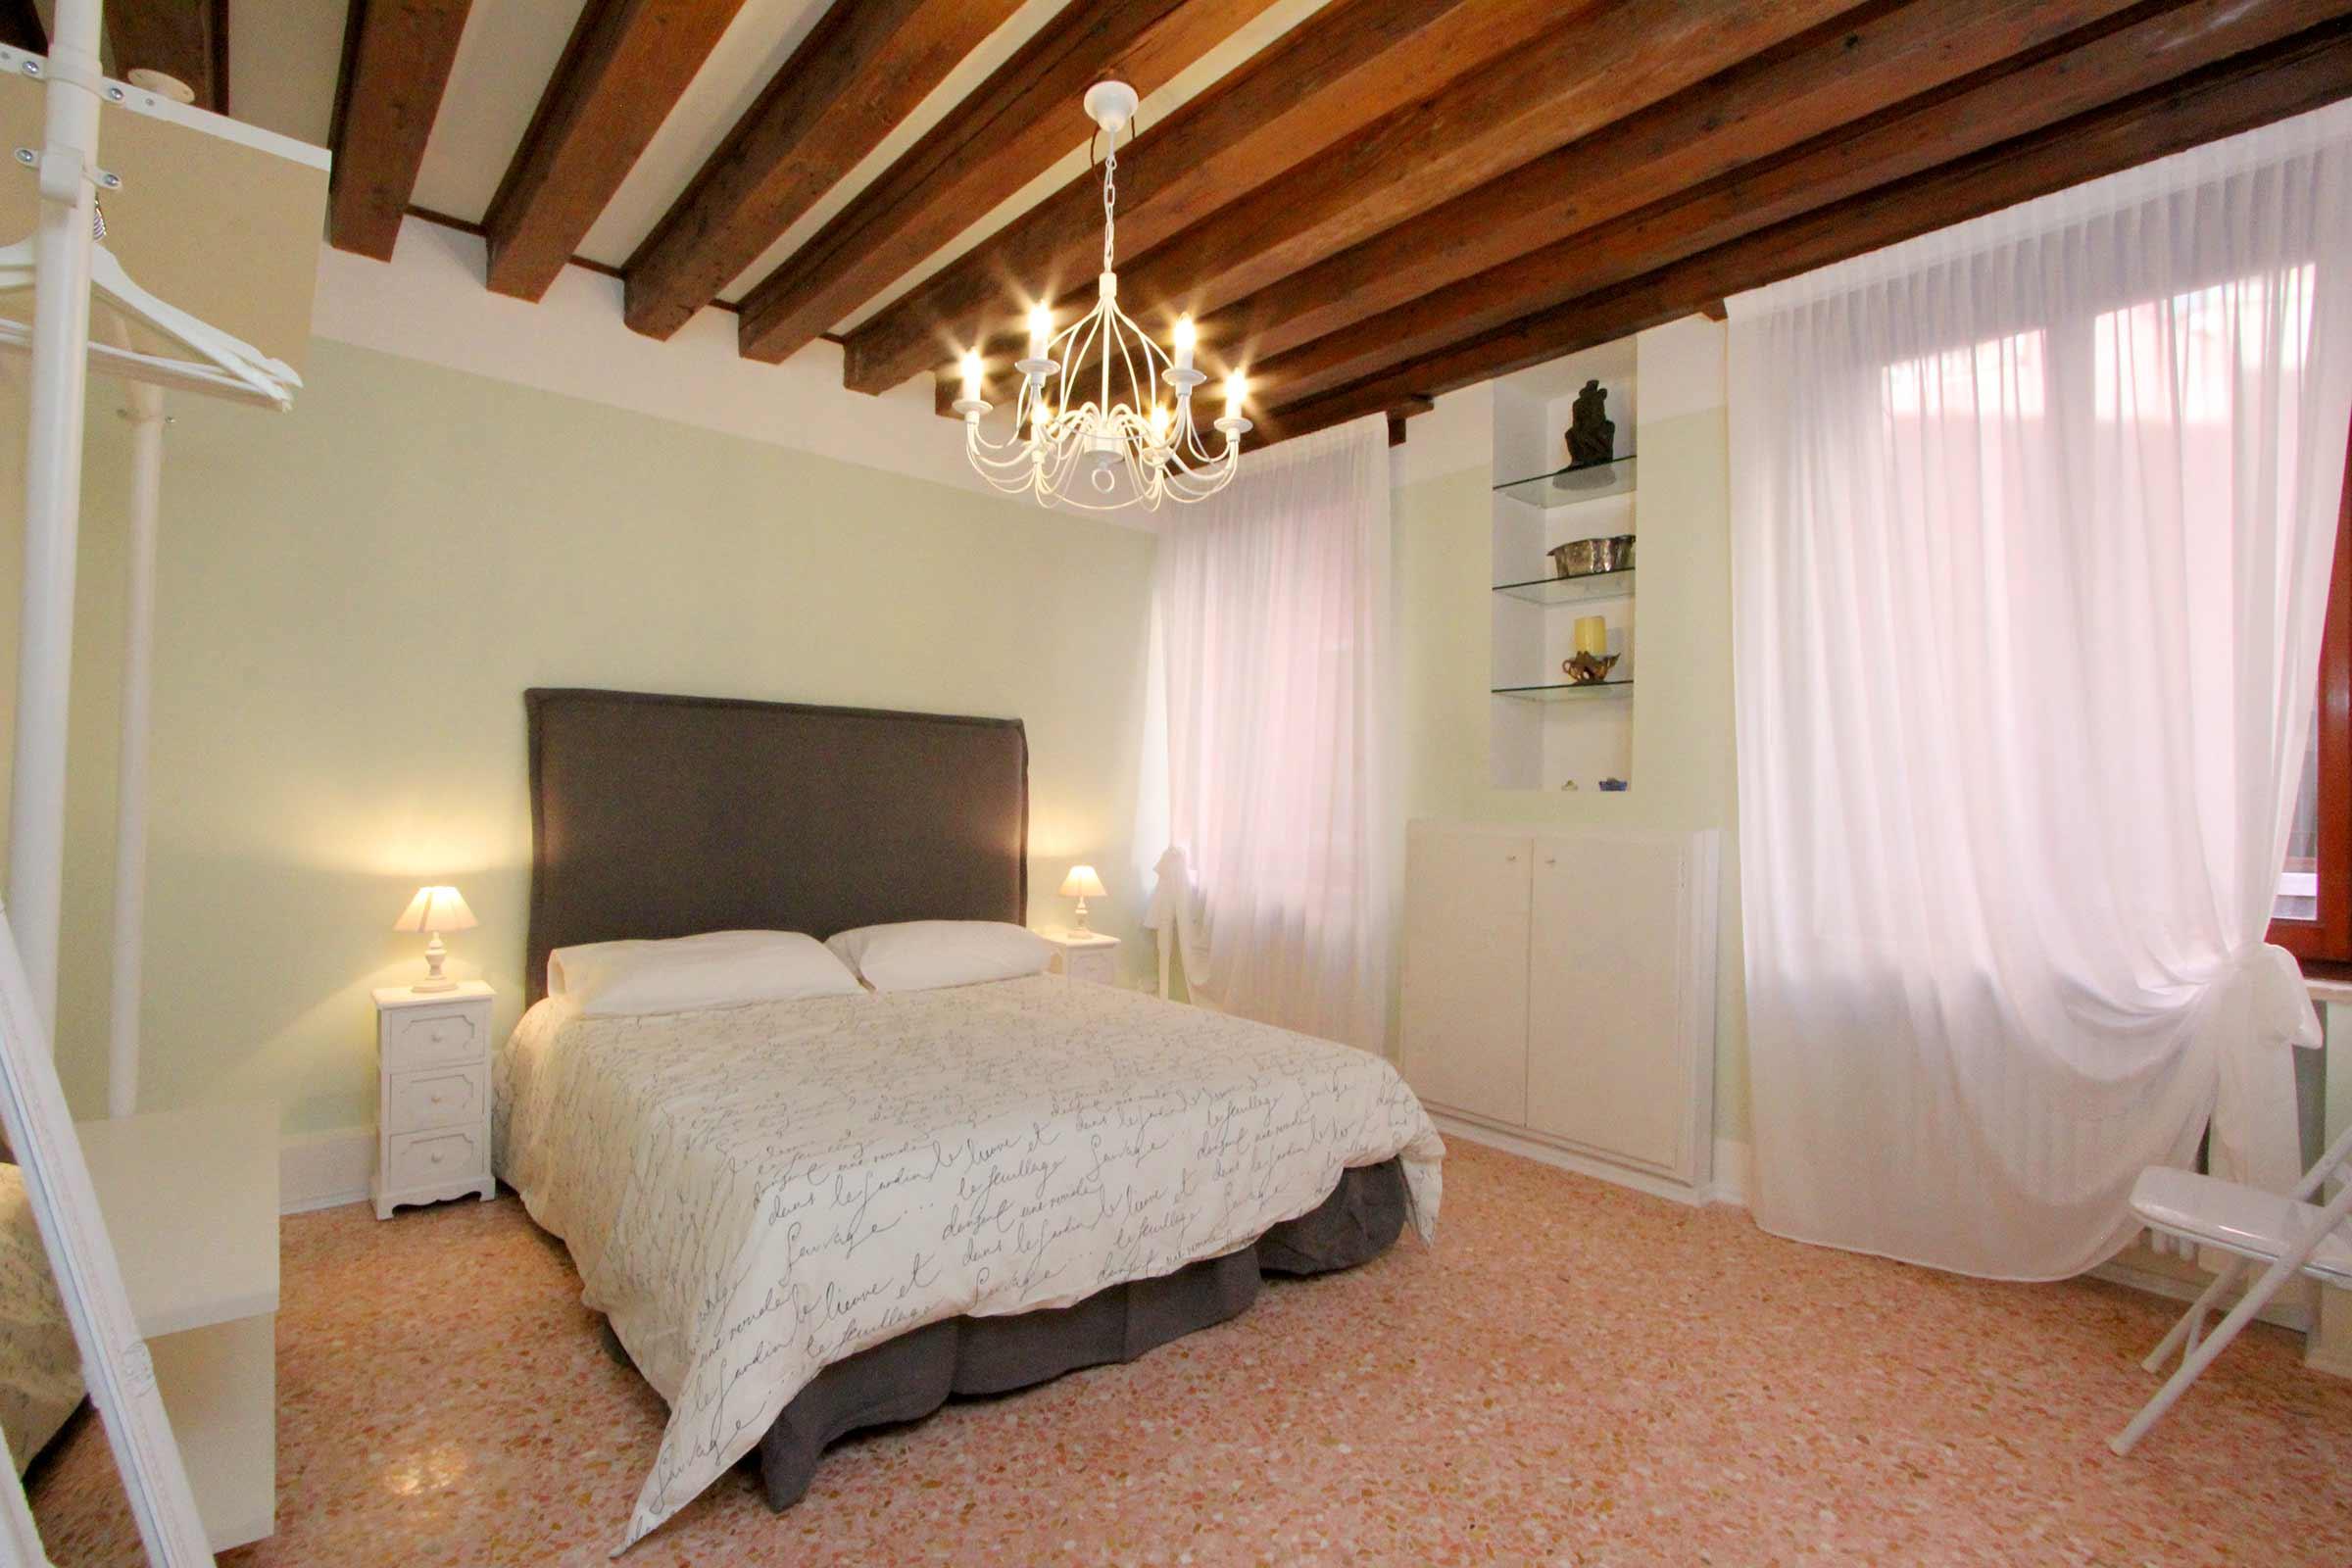 Apartment San Marco Canal San Marco Venice # Meuble Tv Oceania